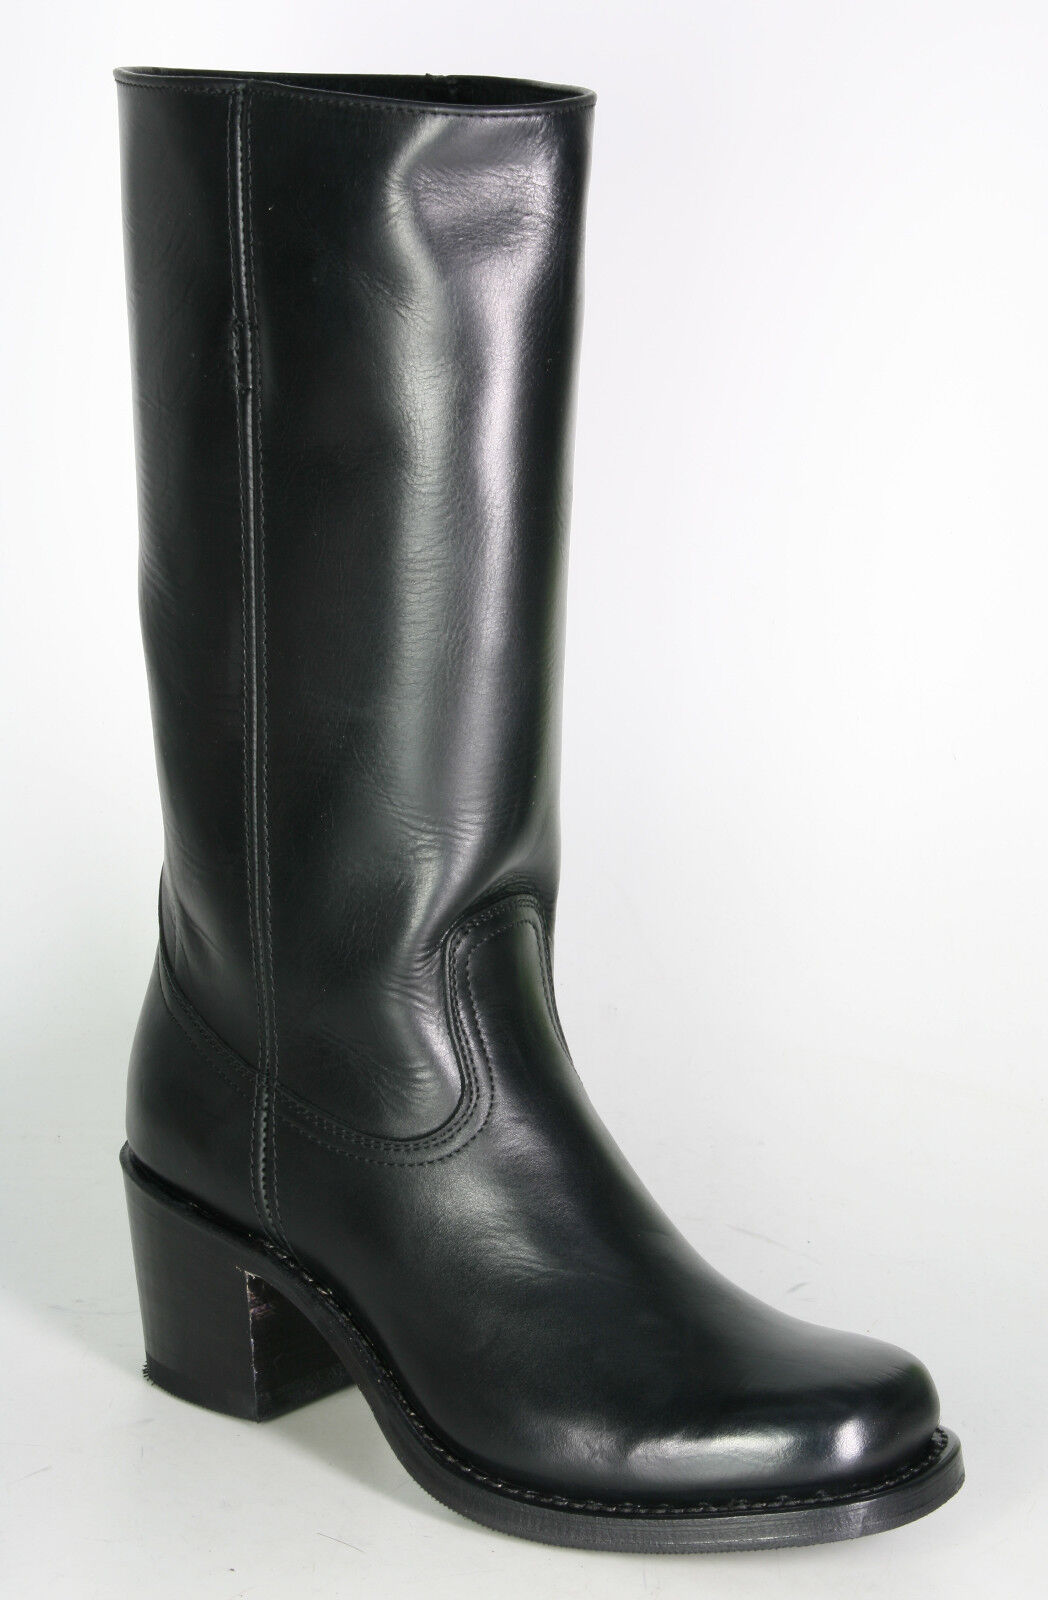 9575 Sendra Stiefel Toledo schwarz Handmade Lederstiefel  Boho-Style